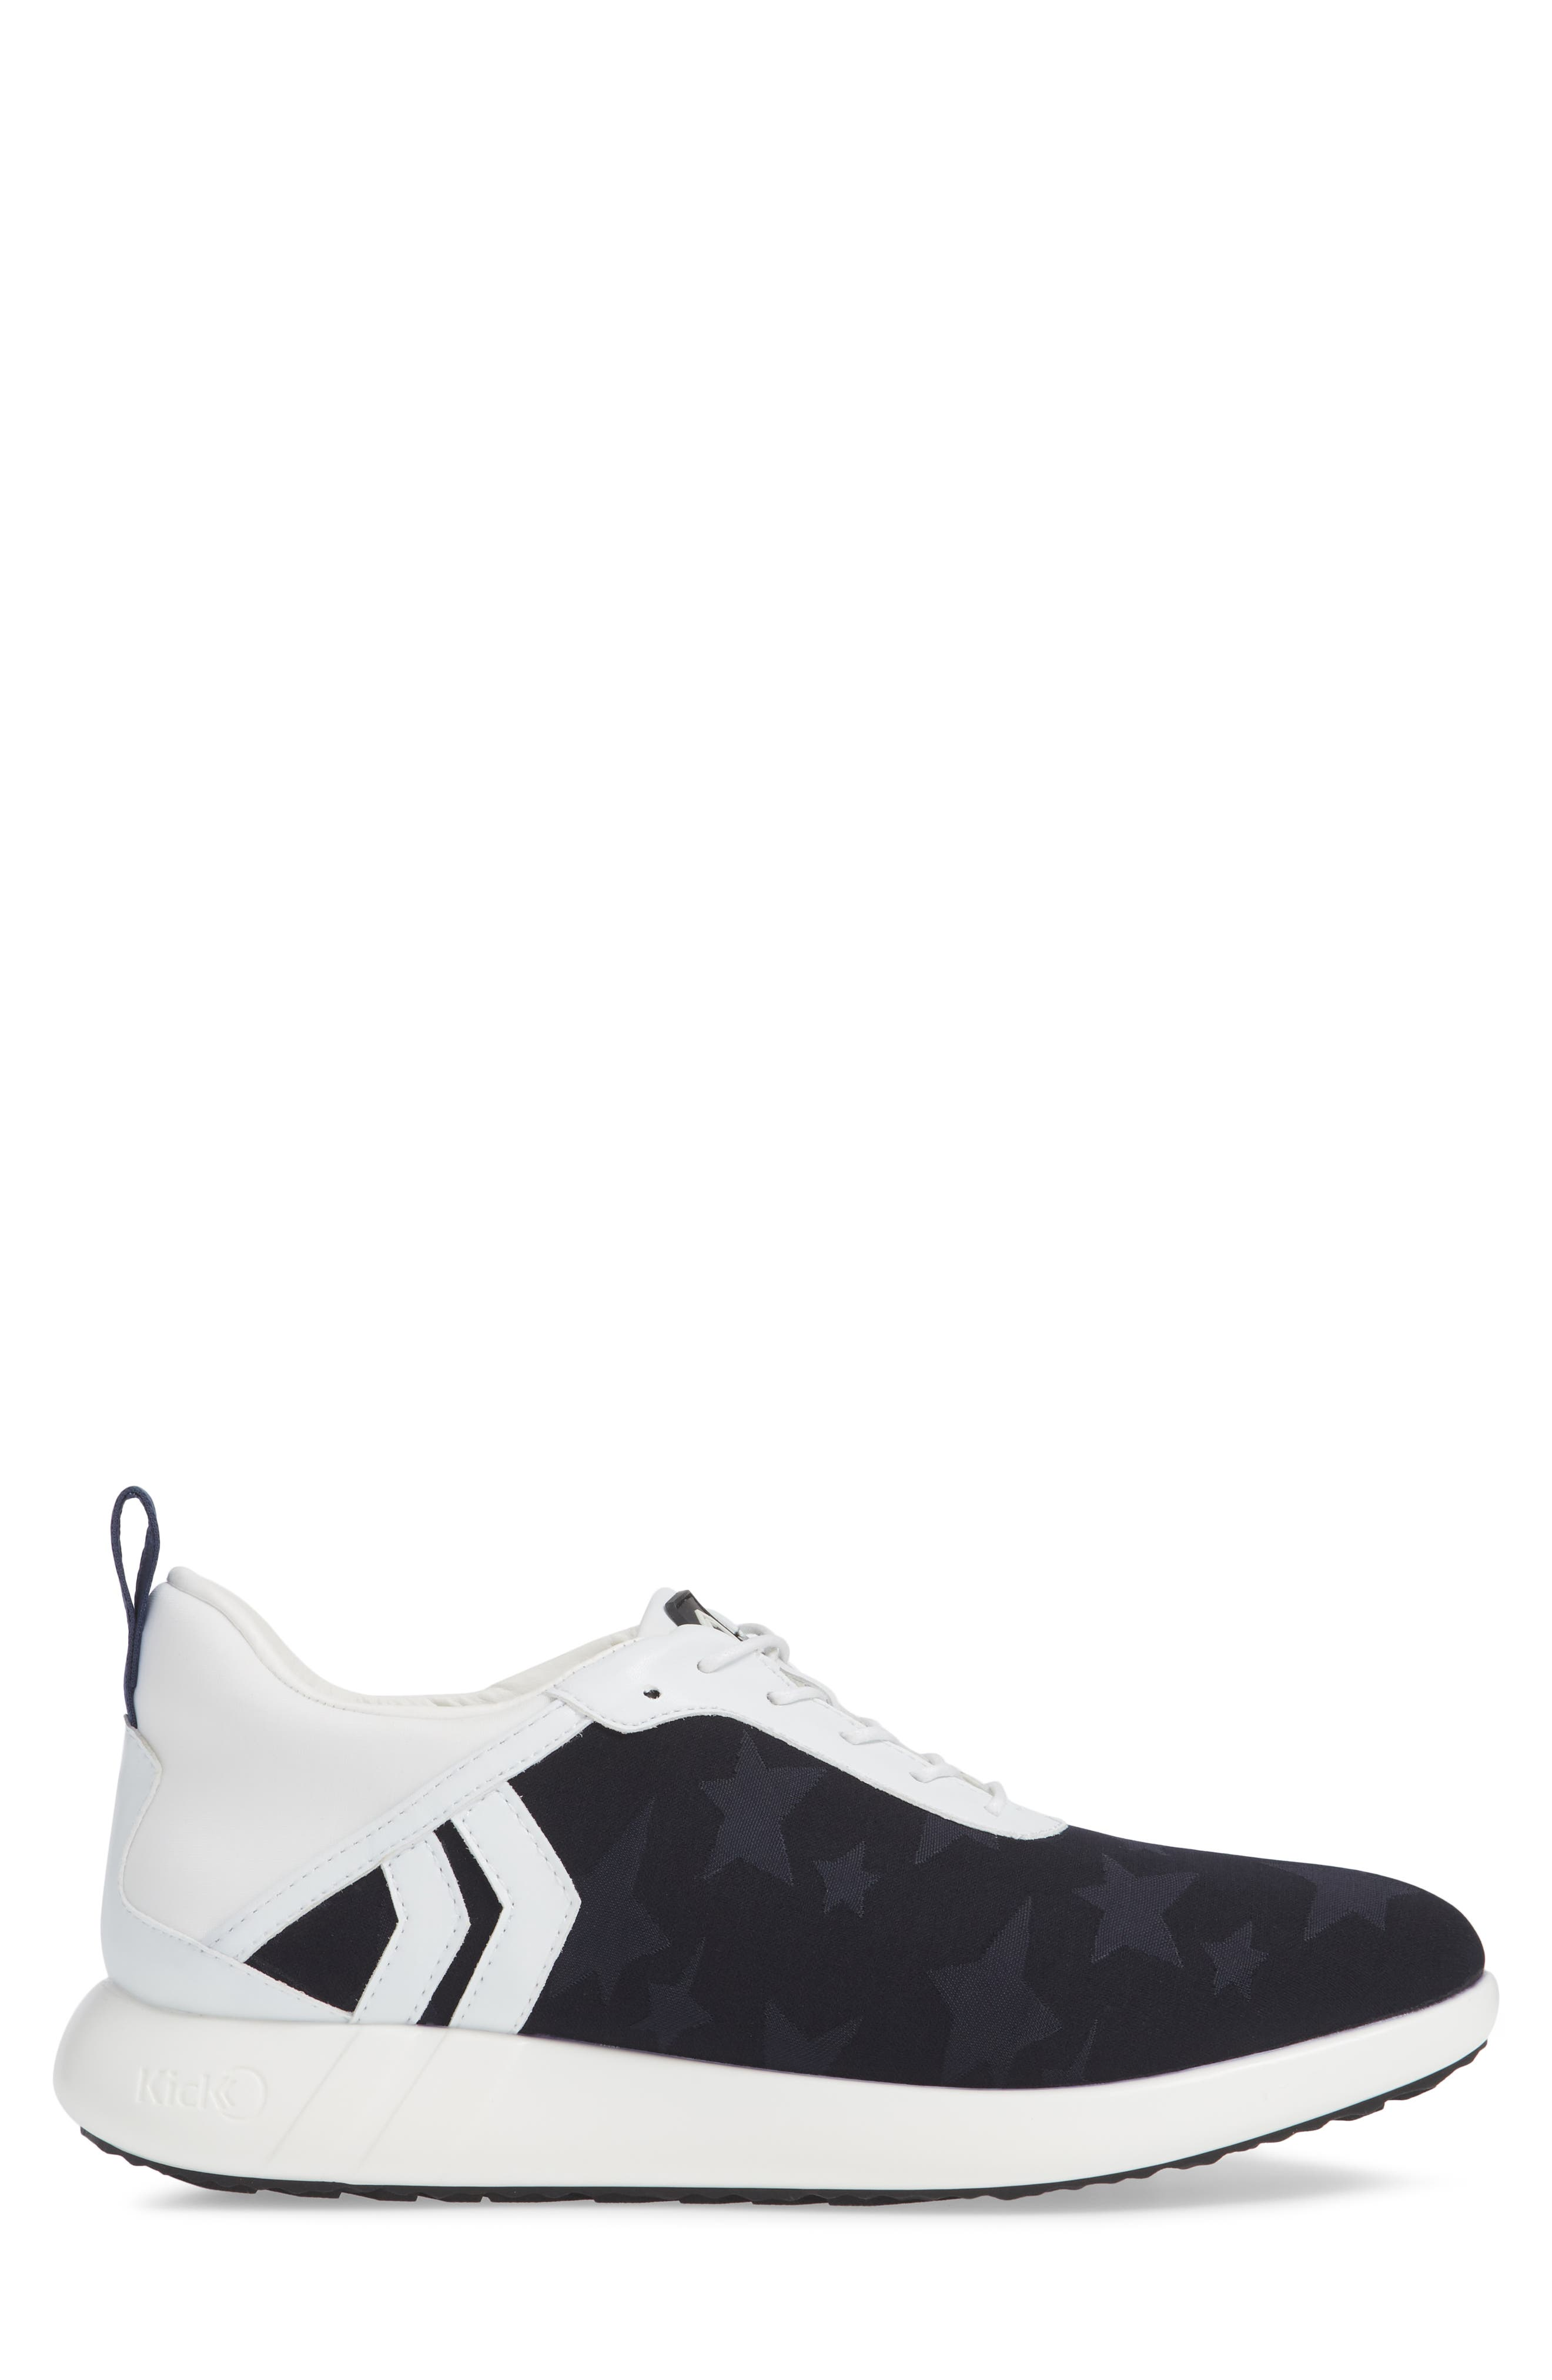 Astro Sneaker,                             Alternate thumbnail 3, color,                             410